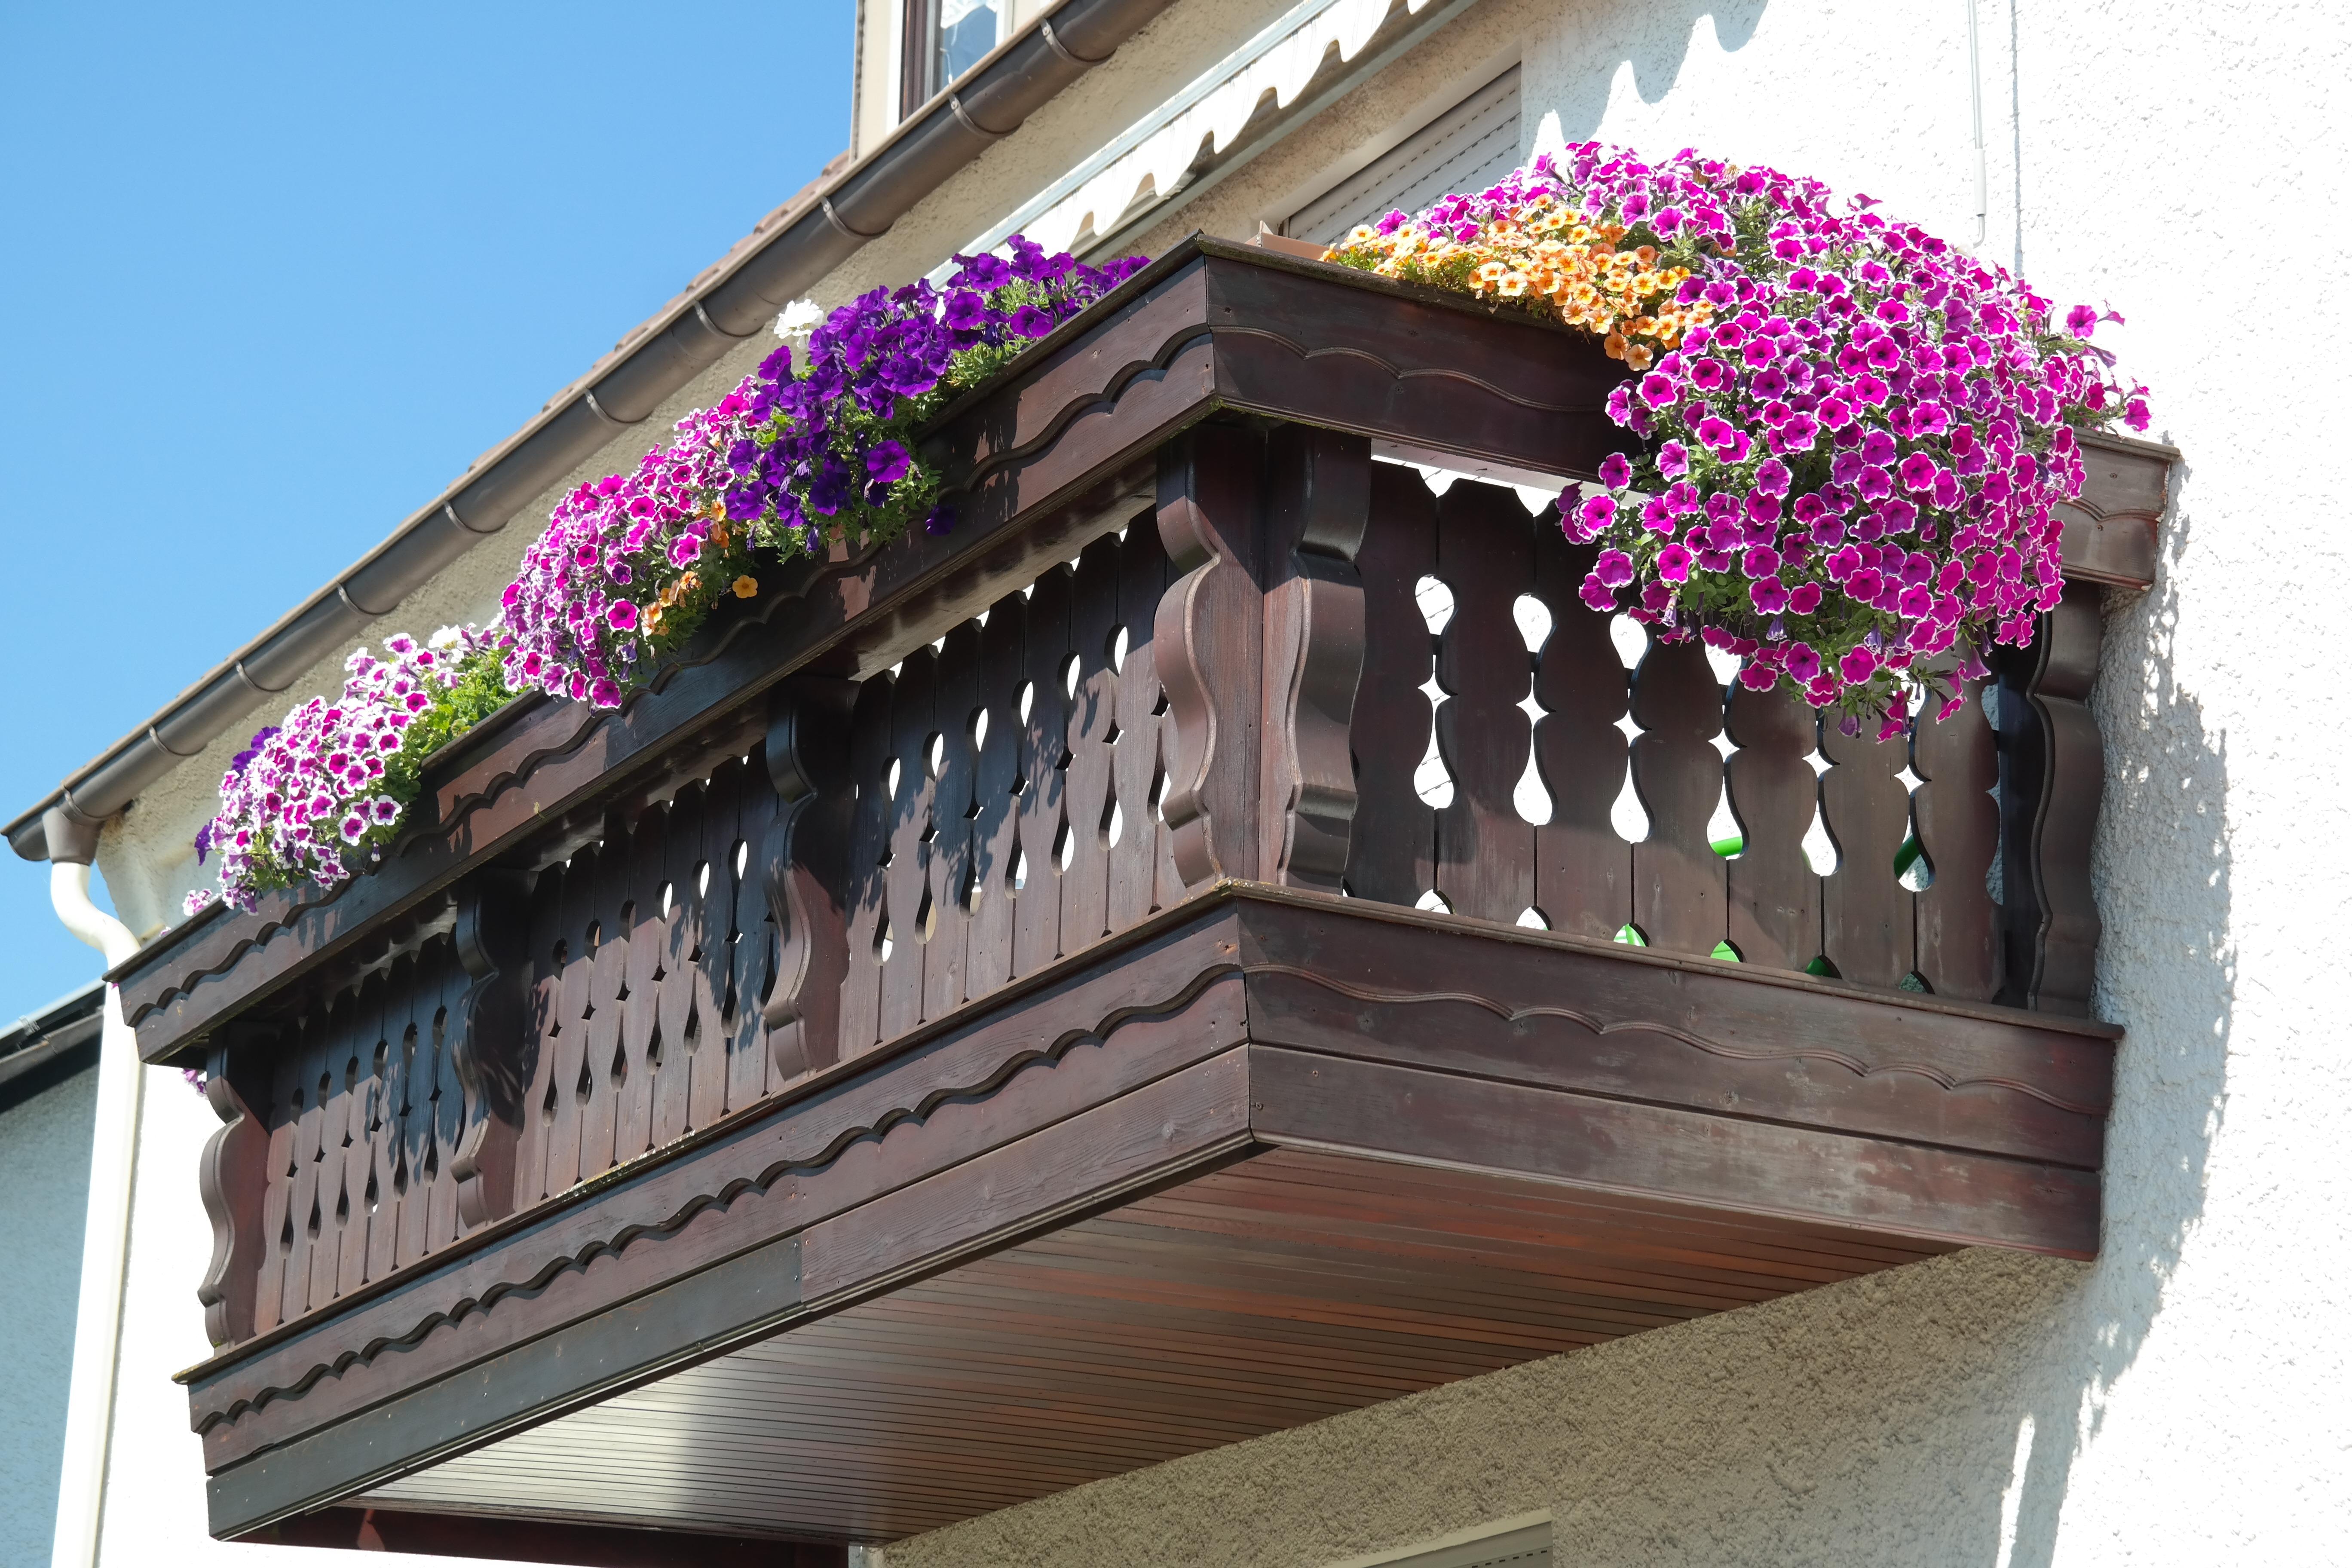 Картинки : архитектура, дом, крыша, балкон, фасад, украшен, .